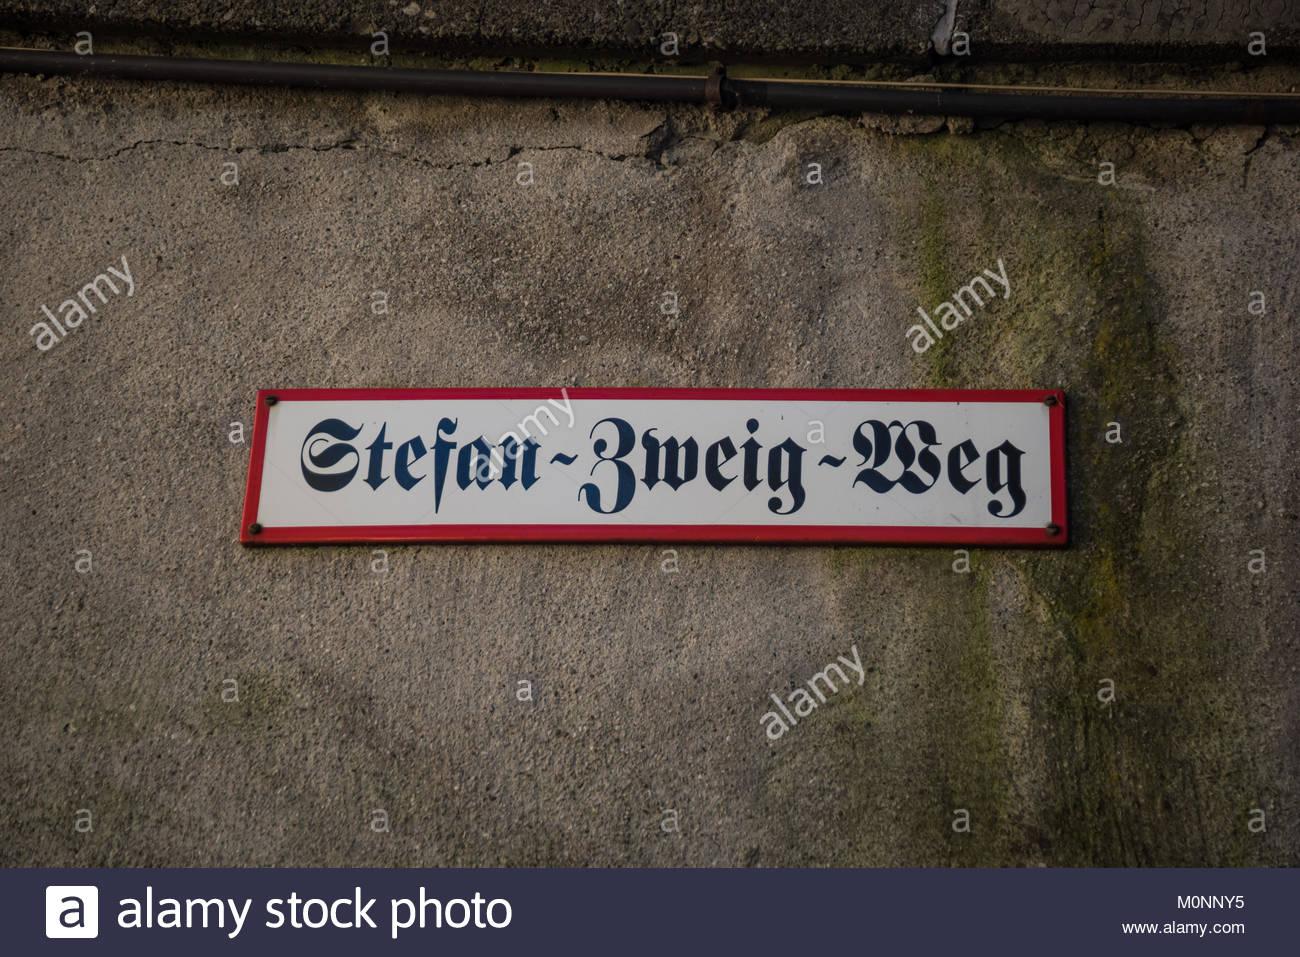 Salzburg, Kapuzinerberg, Stefan-Zweig-Weg - Stock Image